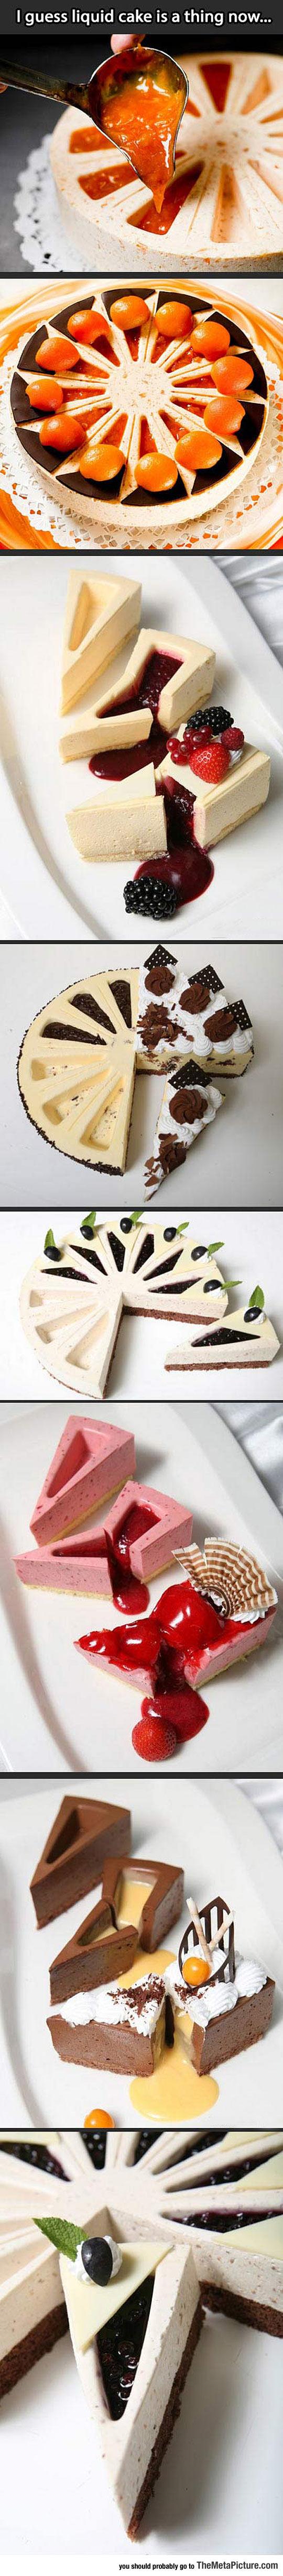 liquid-cake-orange-chocolate-slice